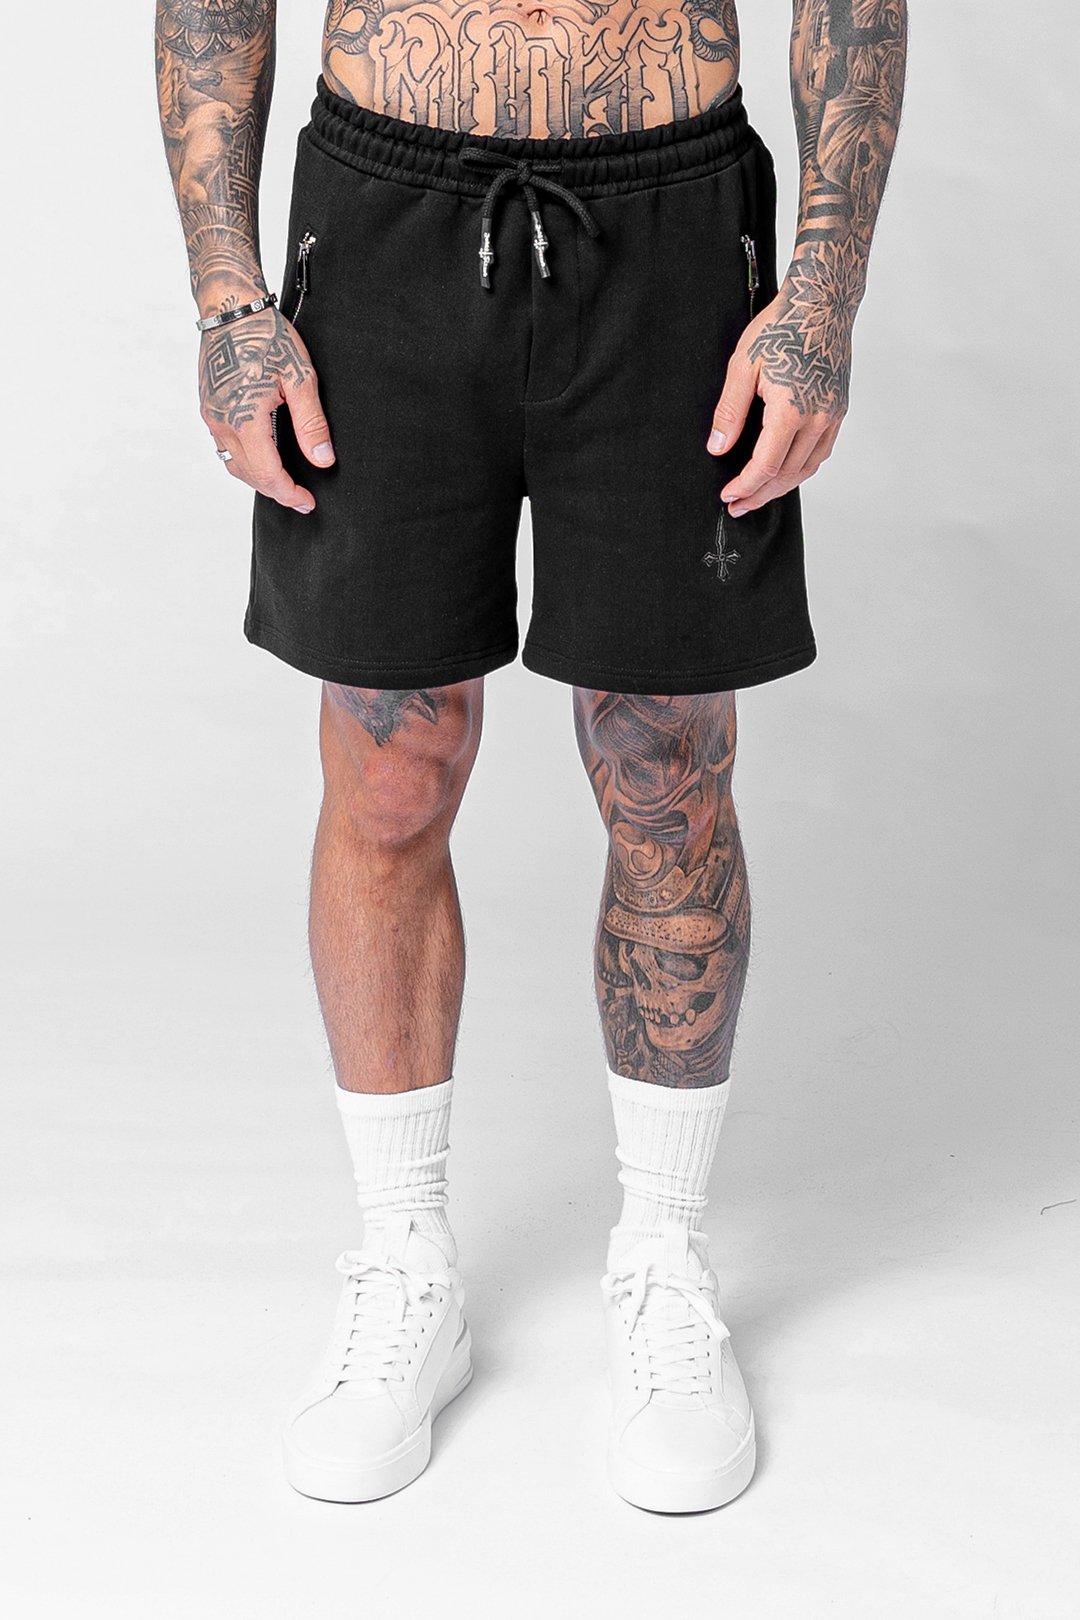 Vanna Essential Men's Jogger Shorts - Black, XX-Large